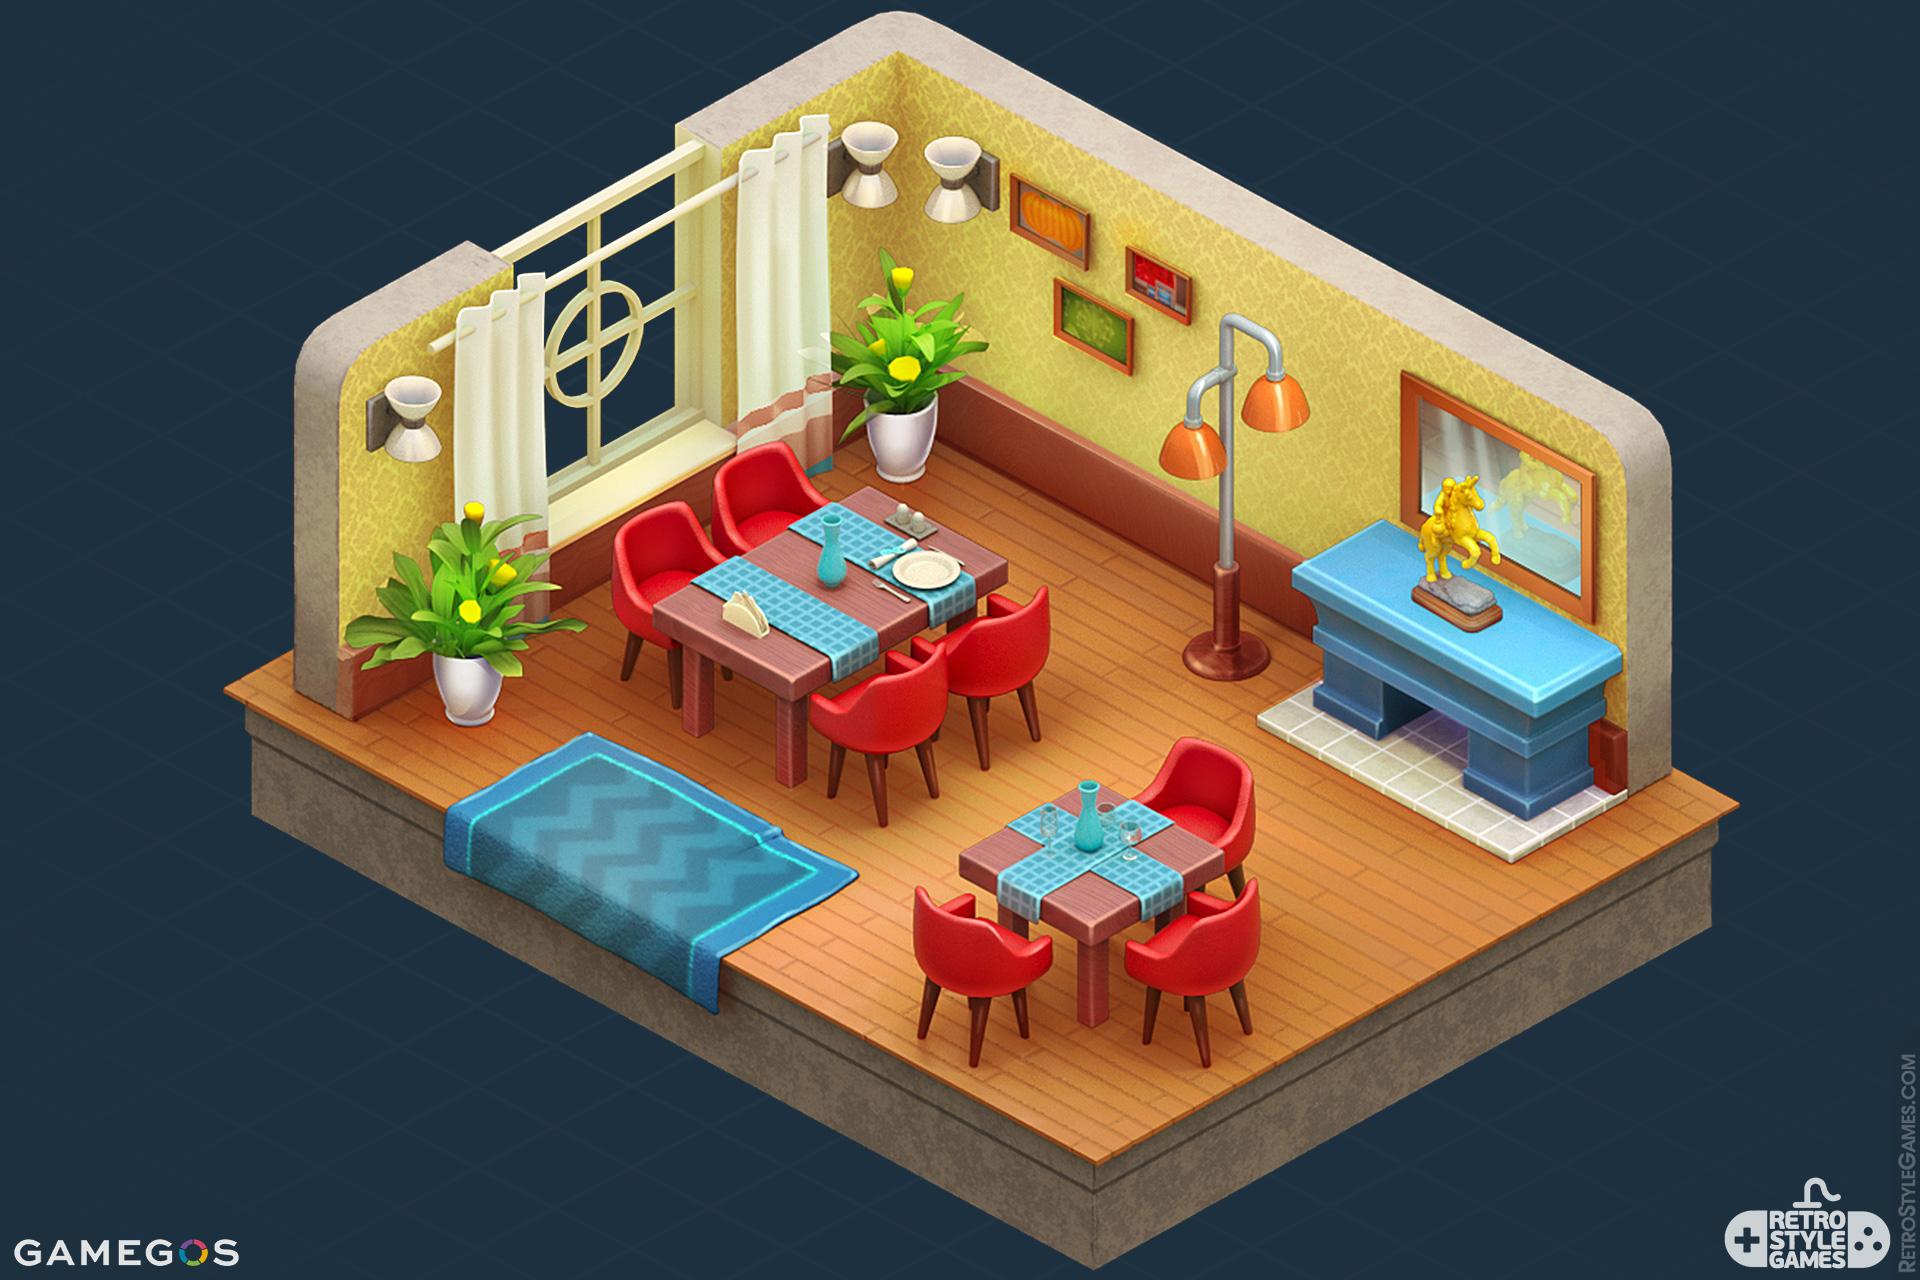 Pre-Rendered Isometric 3D Sprite Room Interior